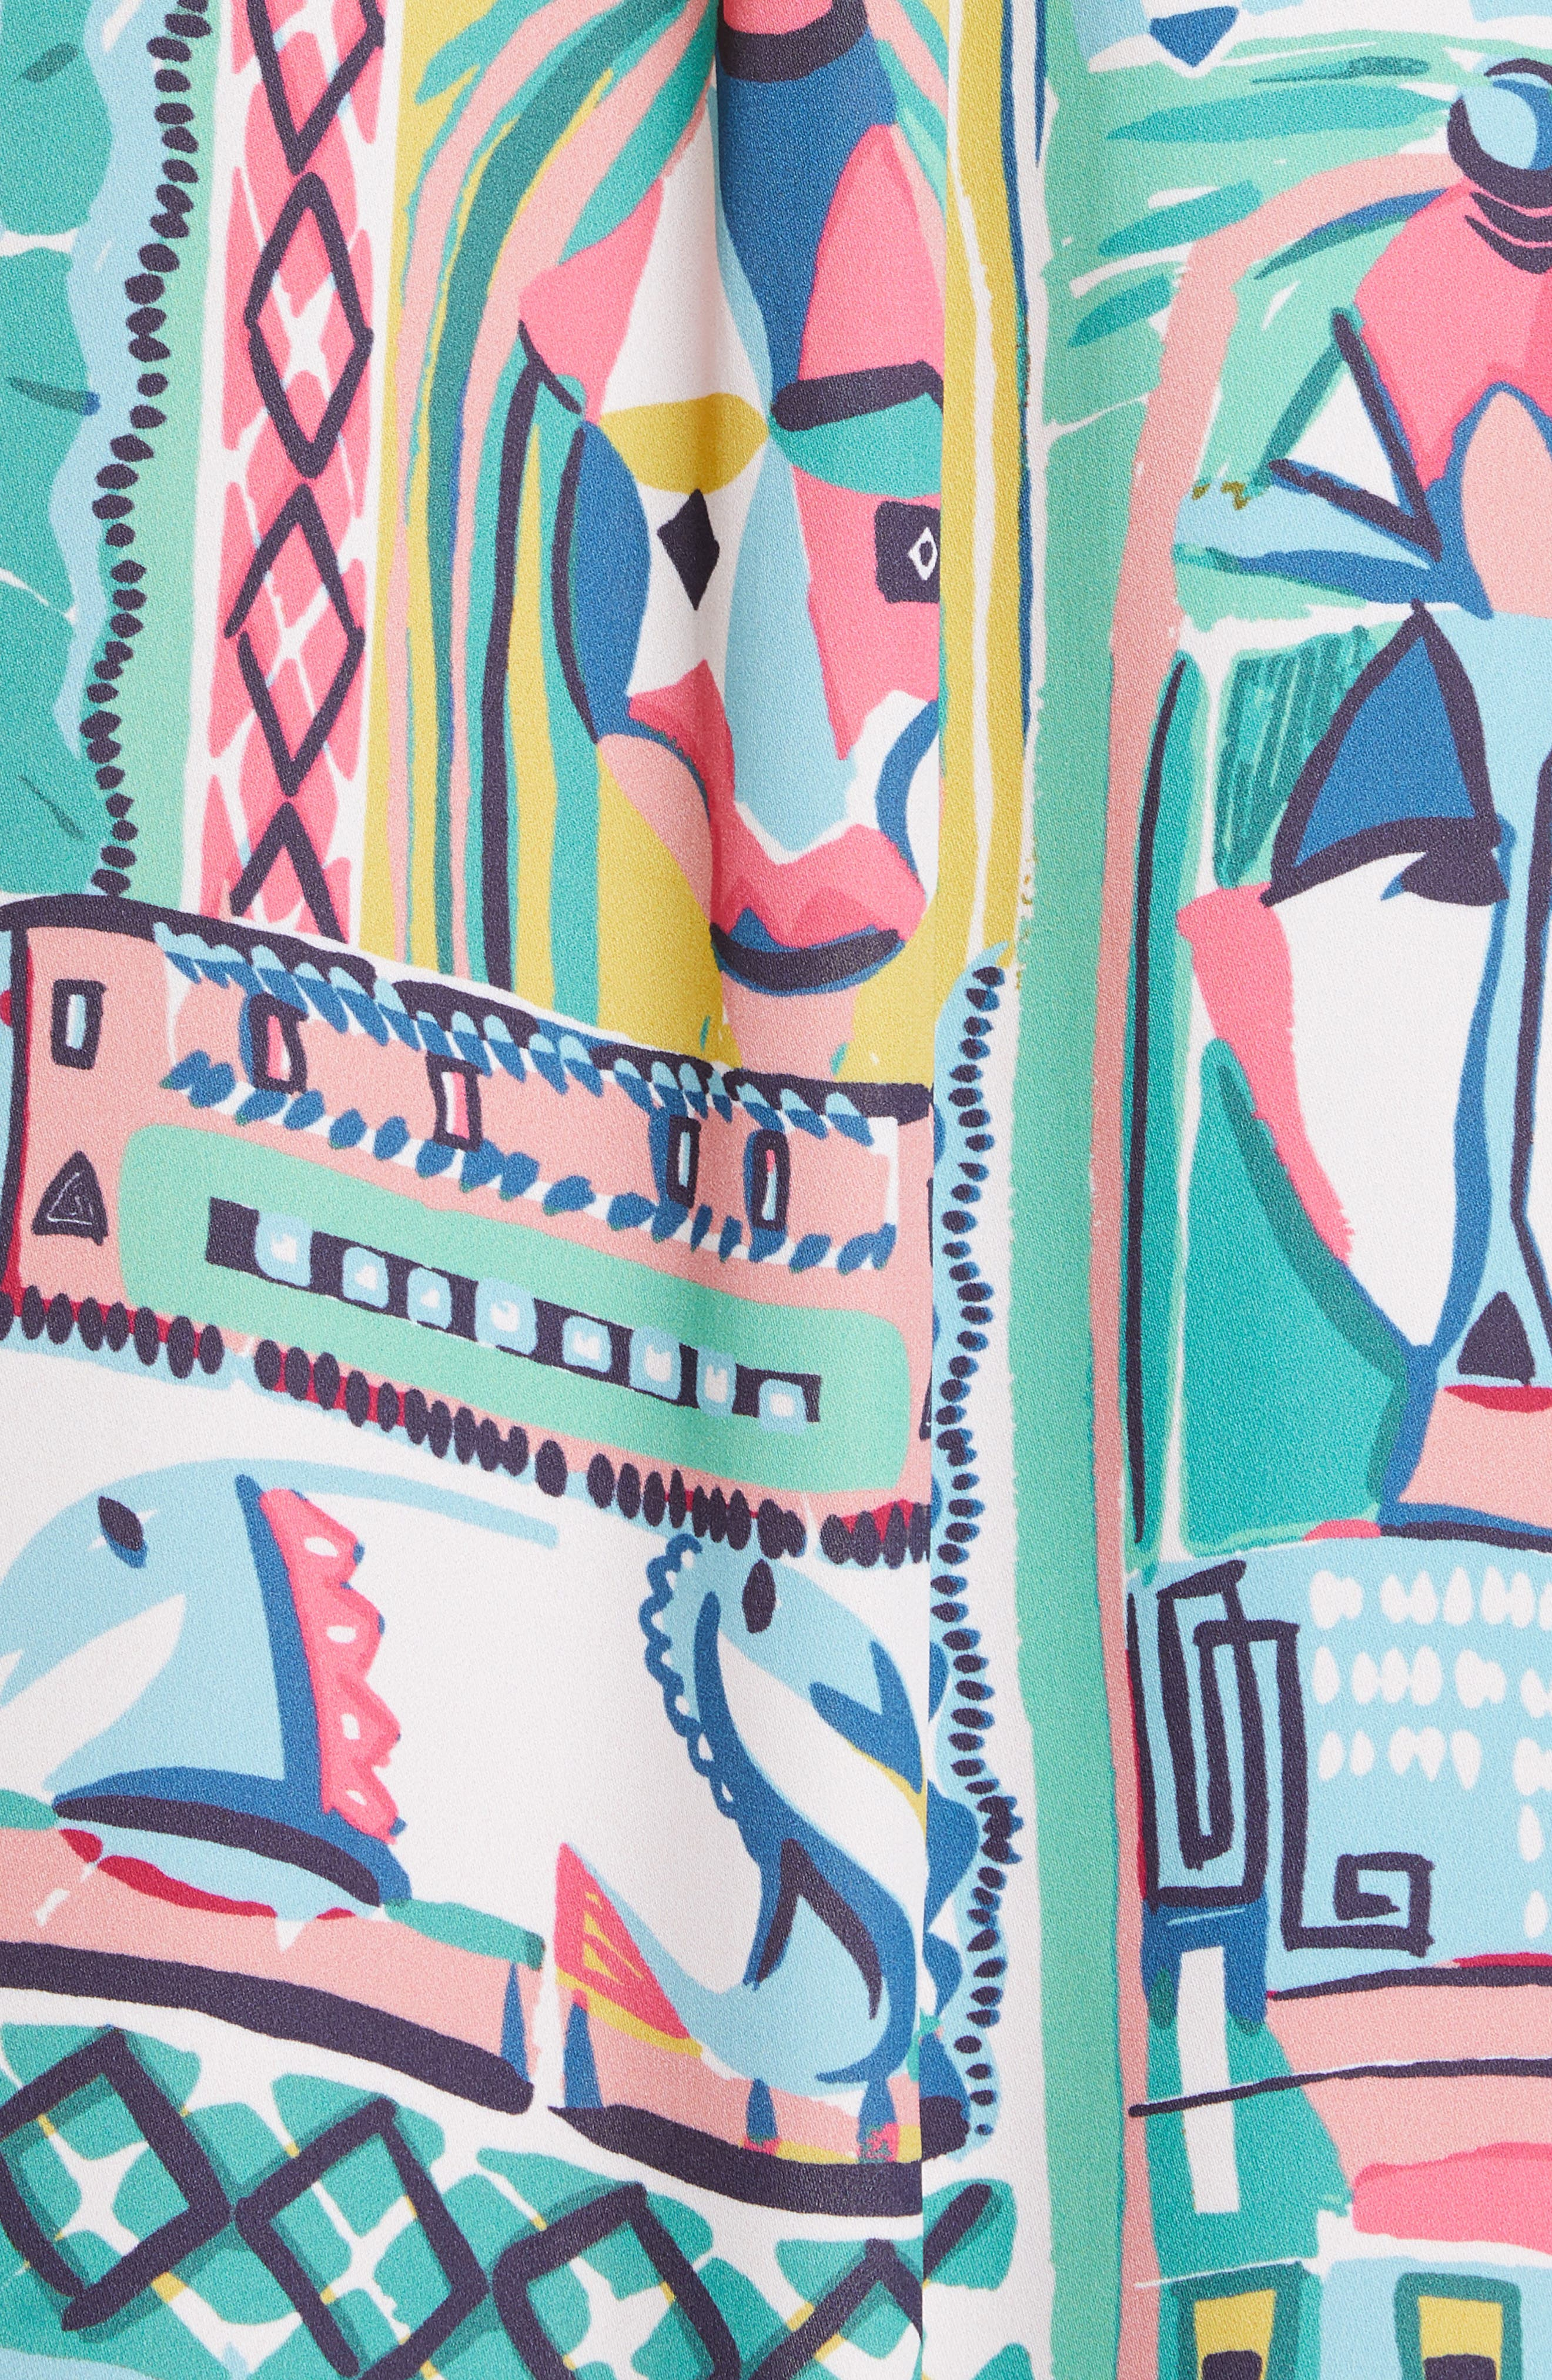 LAFAYETTE 148 NEW YORK, Doha Palazzo Patchwork Print Maxi Shirtdress, Alternate thumbnail 5, color, 400